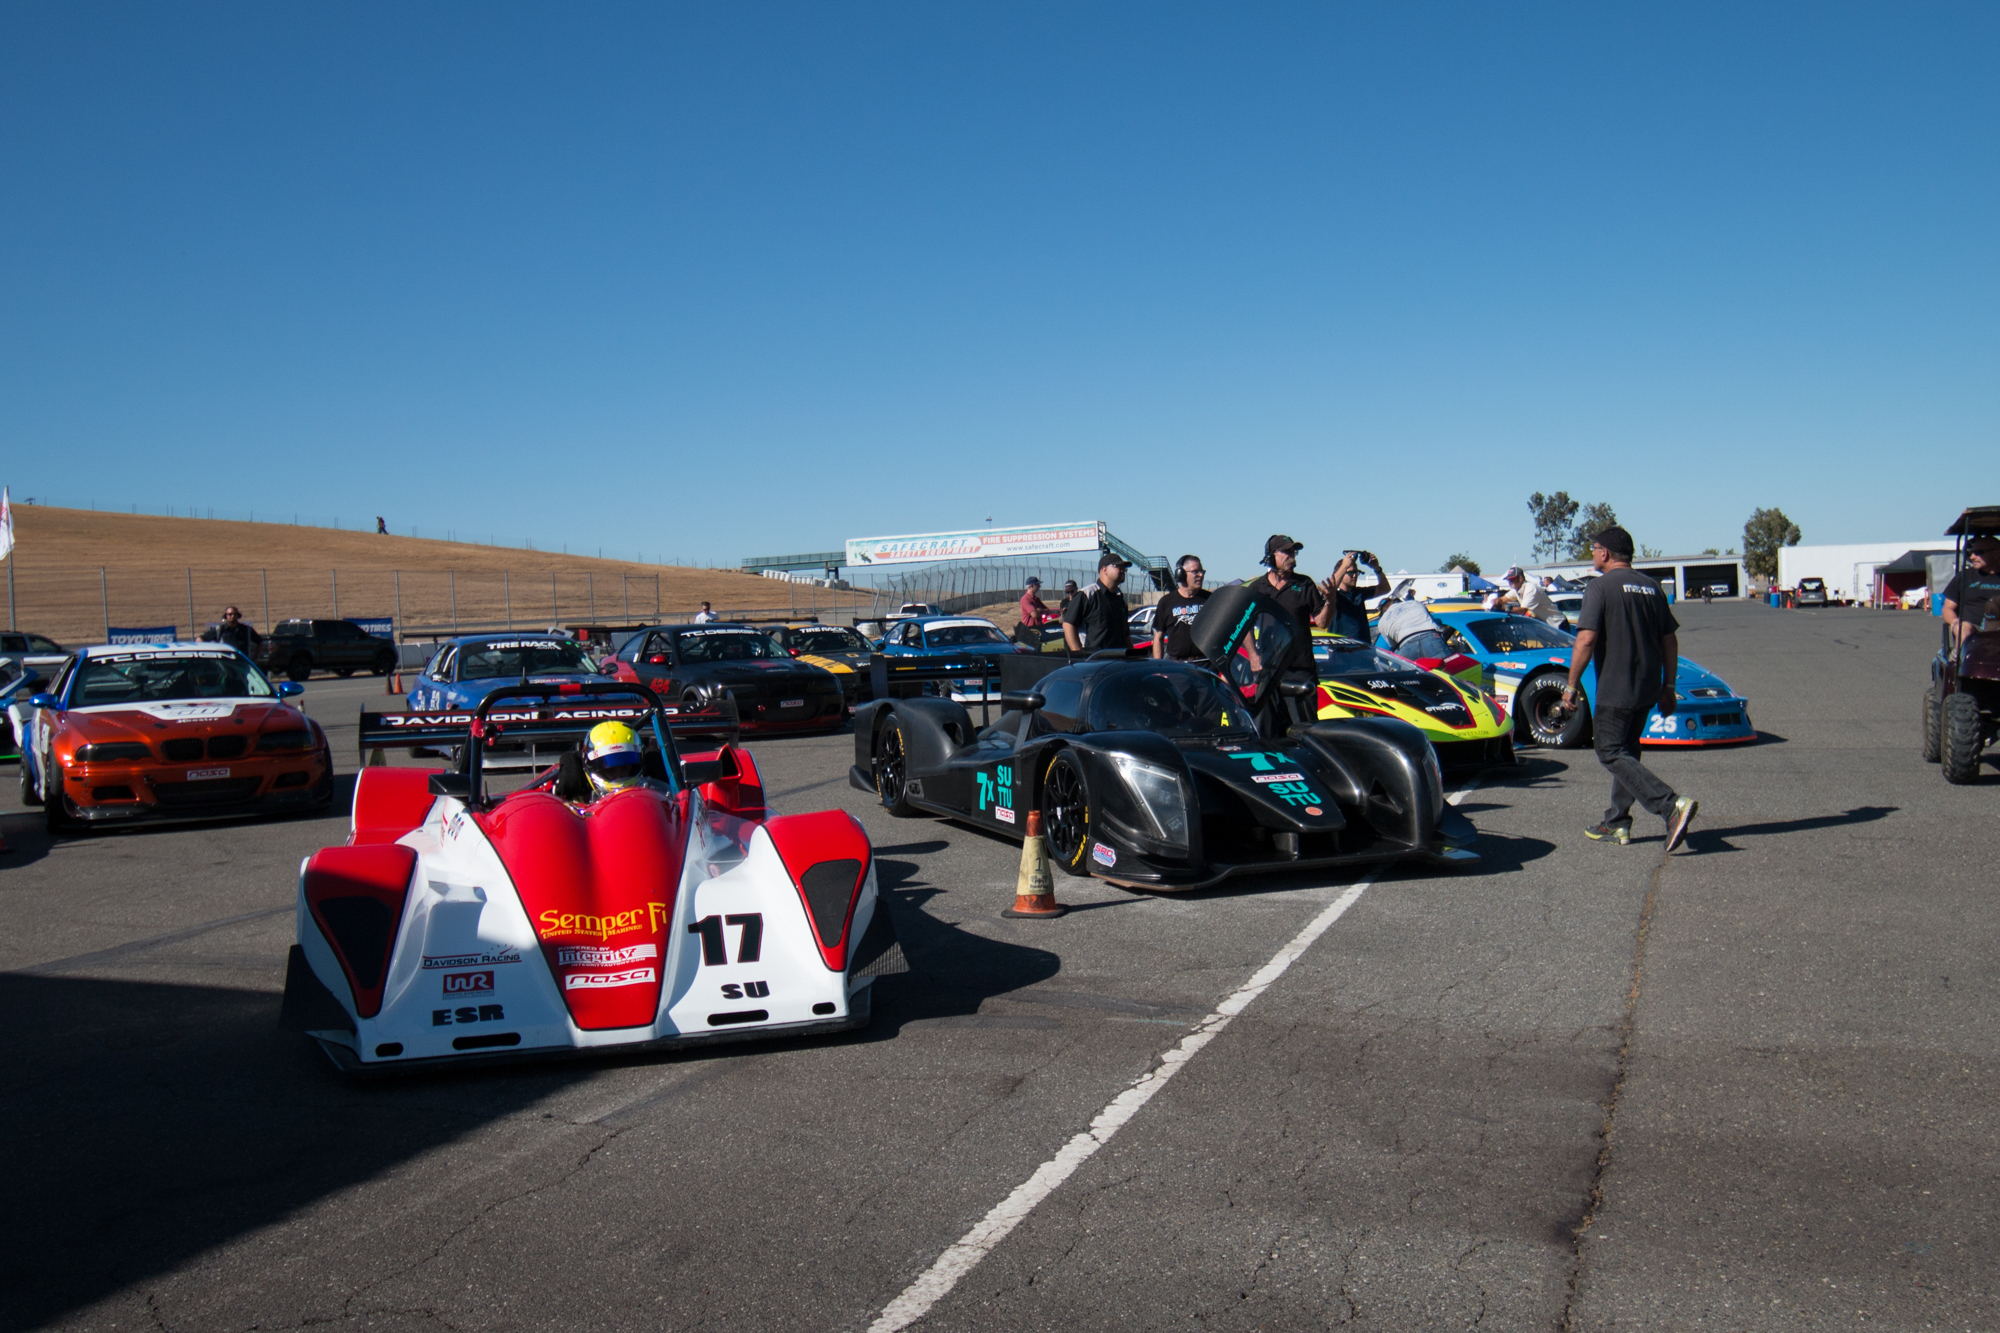 Steven-Racing-20130206-44820.jpg